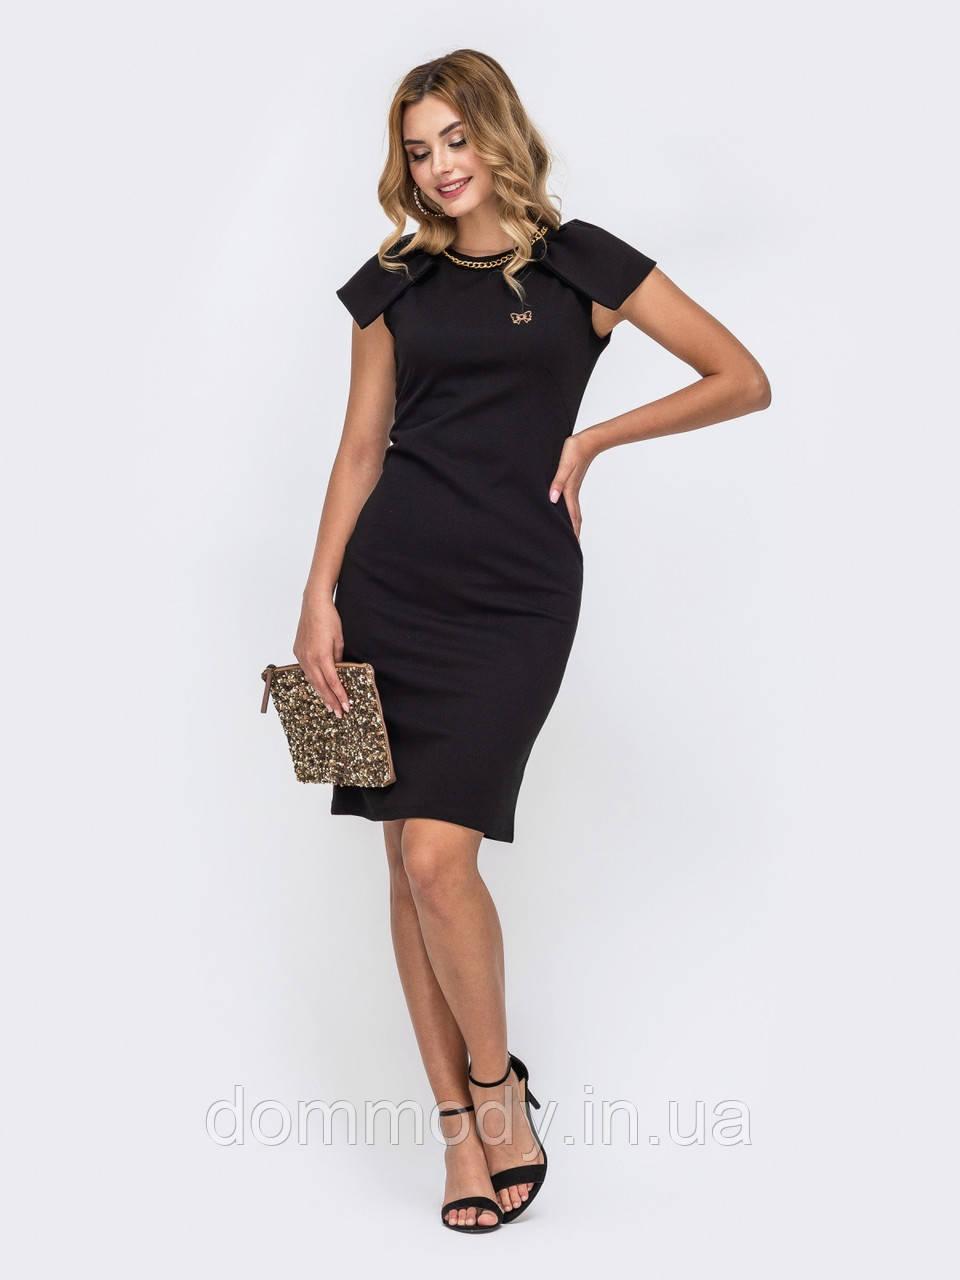 Платье женское Molly black